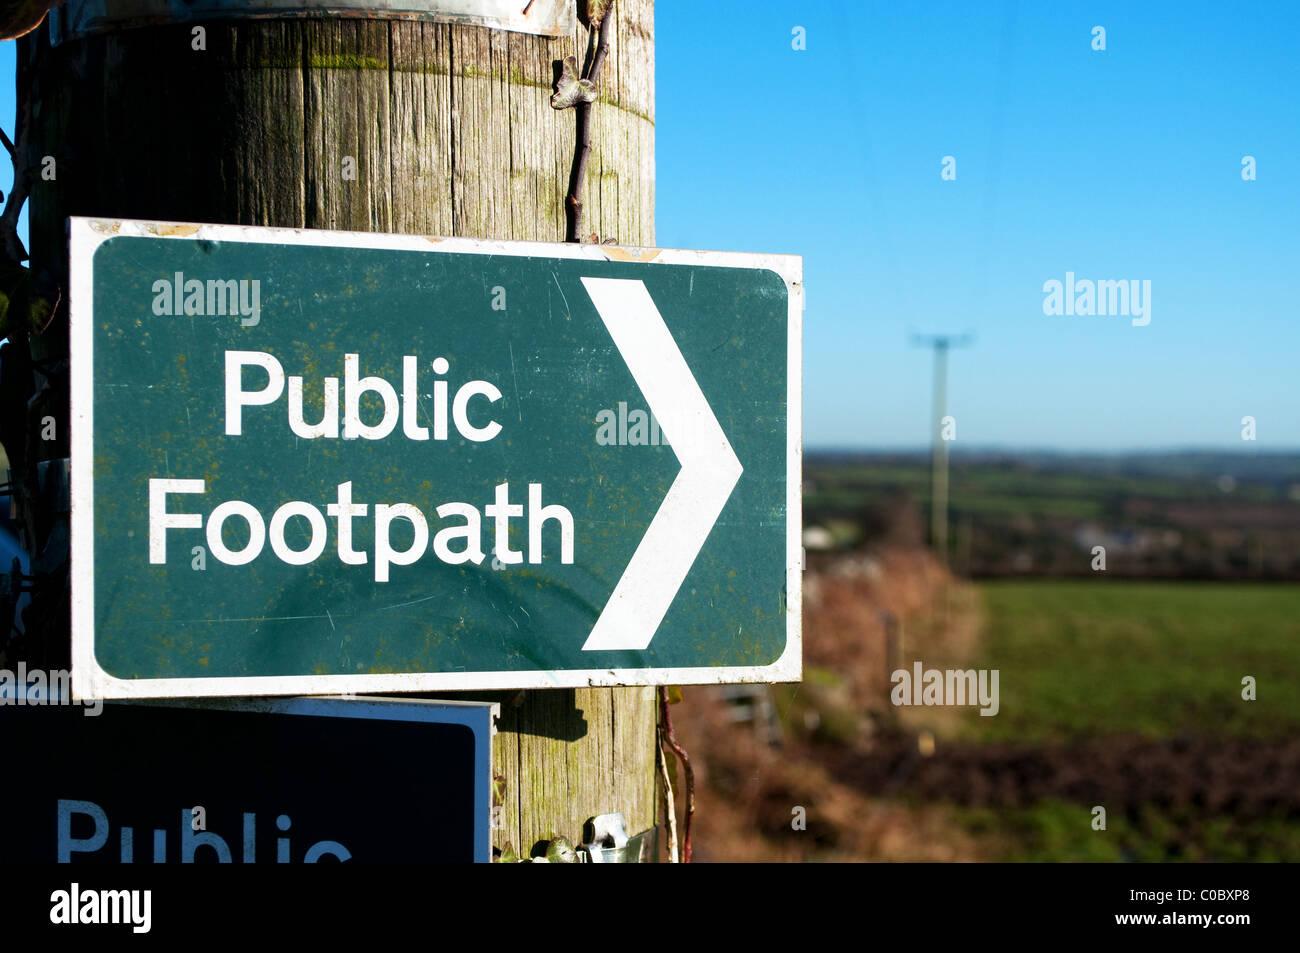 a public footpath sign, cumbria, uk - Stock Image